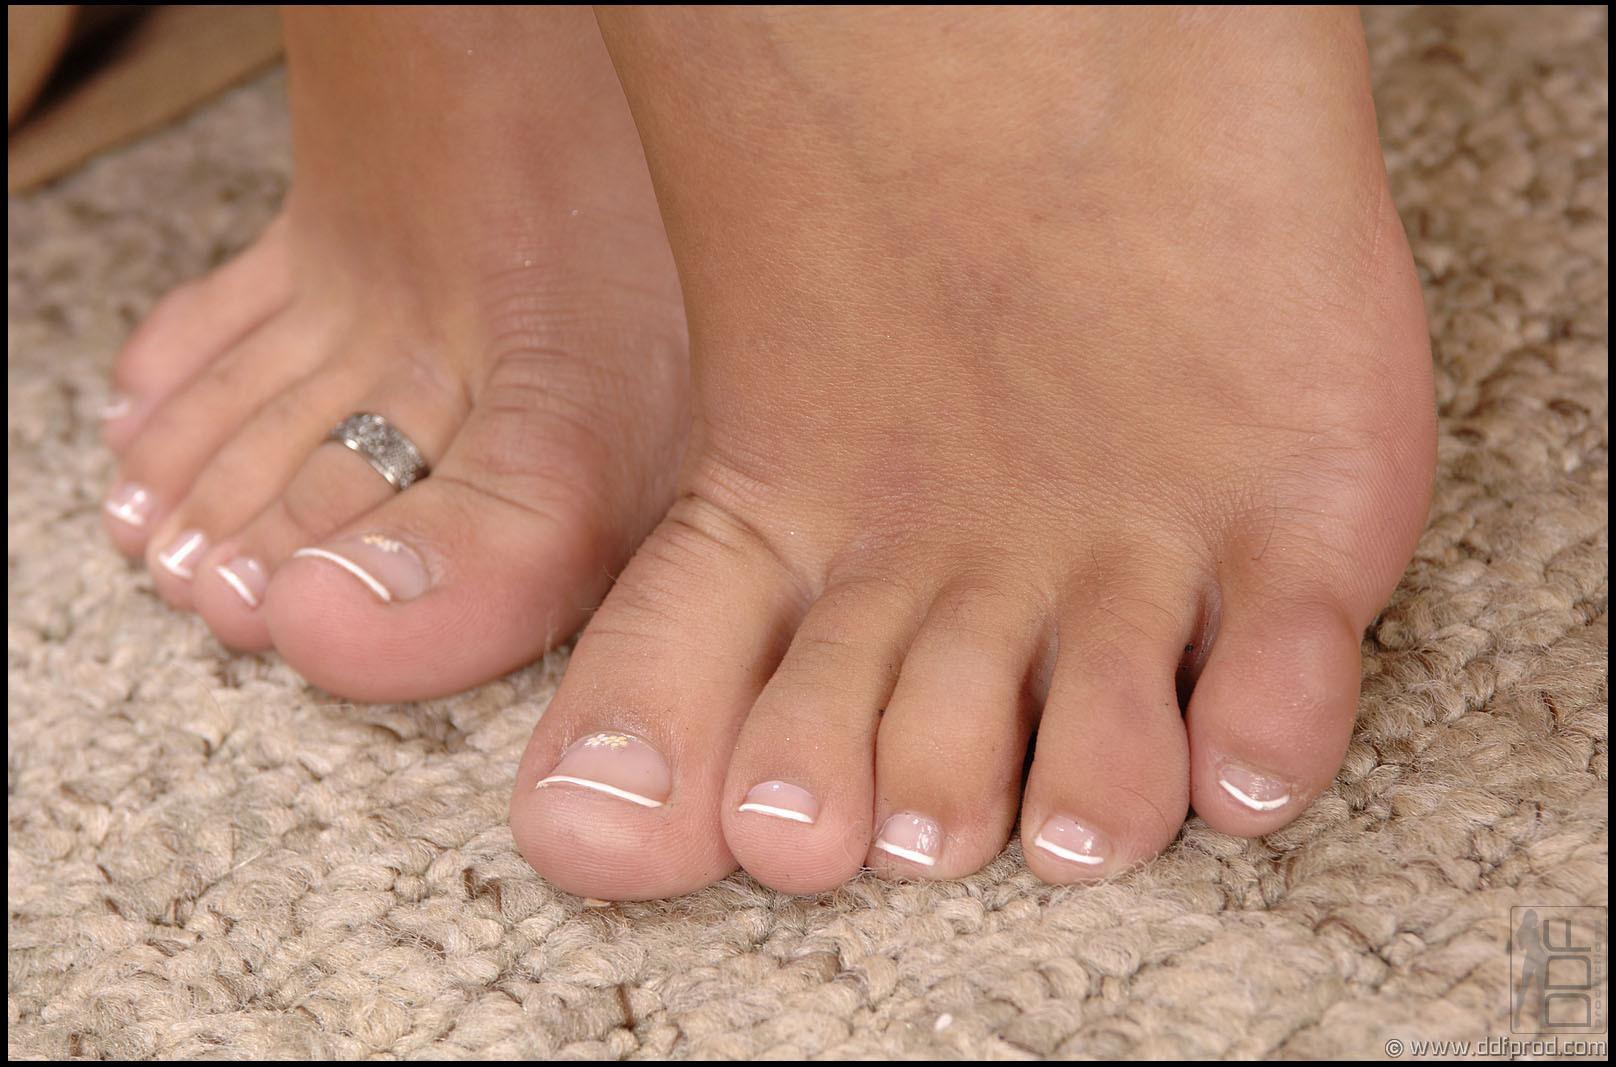 Janet Joy's Feet